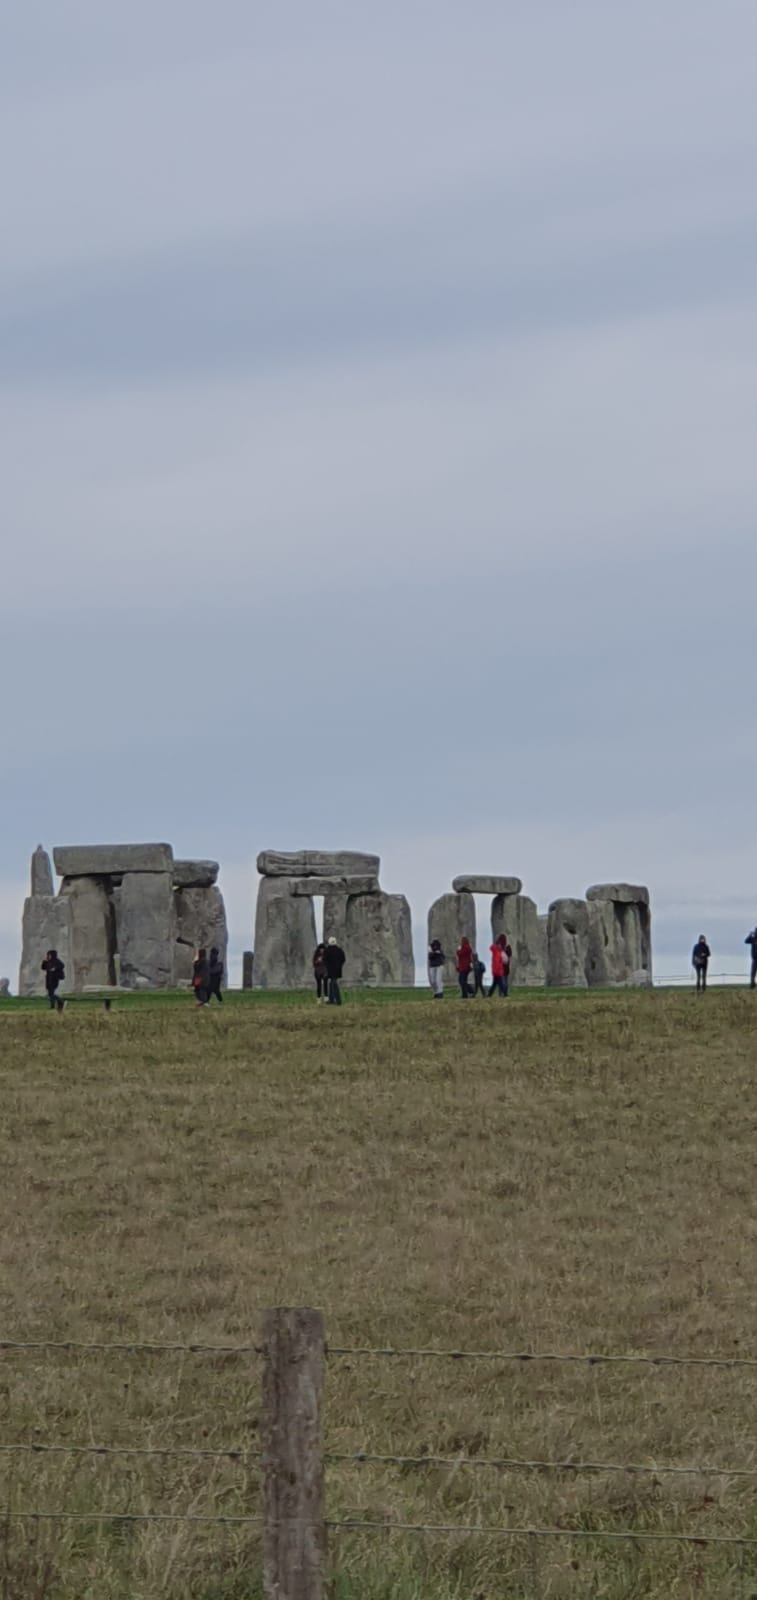 75478439_432793397639777_5823670130877399040_n-jpg.53673_Stonehenge & Avebury stone circle_Travel Stories_Squat the Planet_4:42 PM